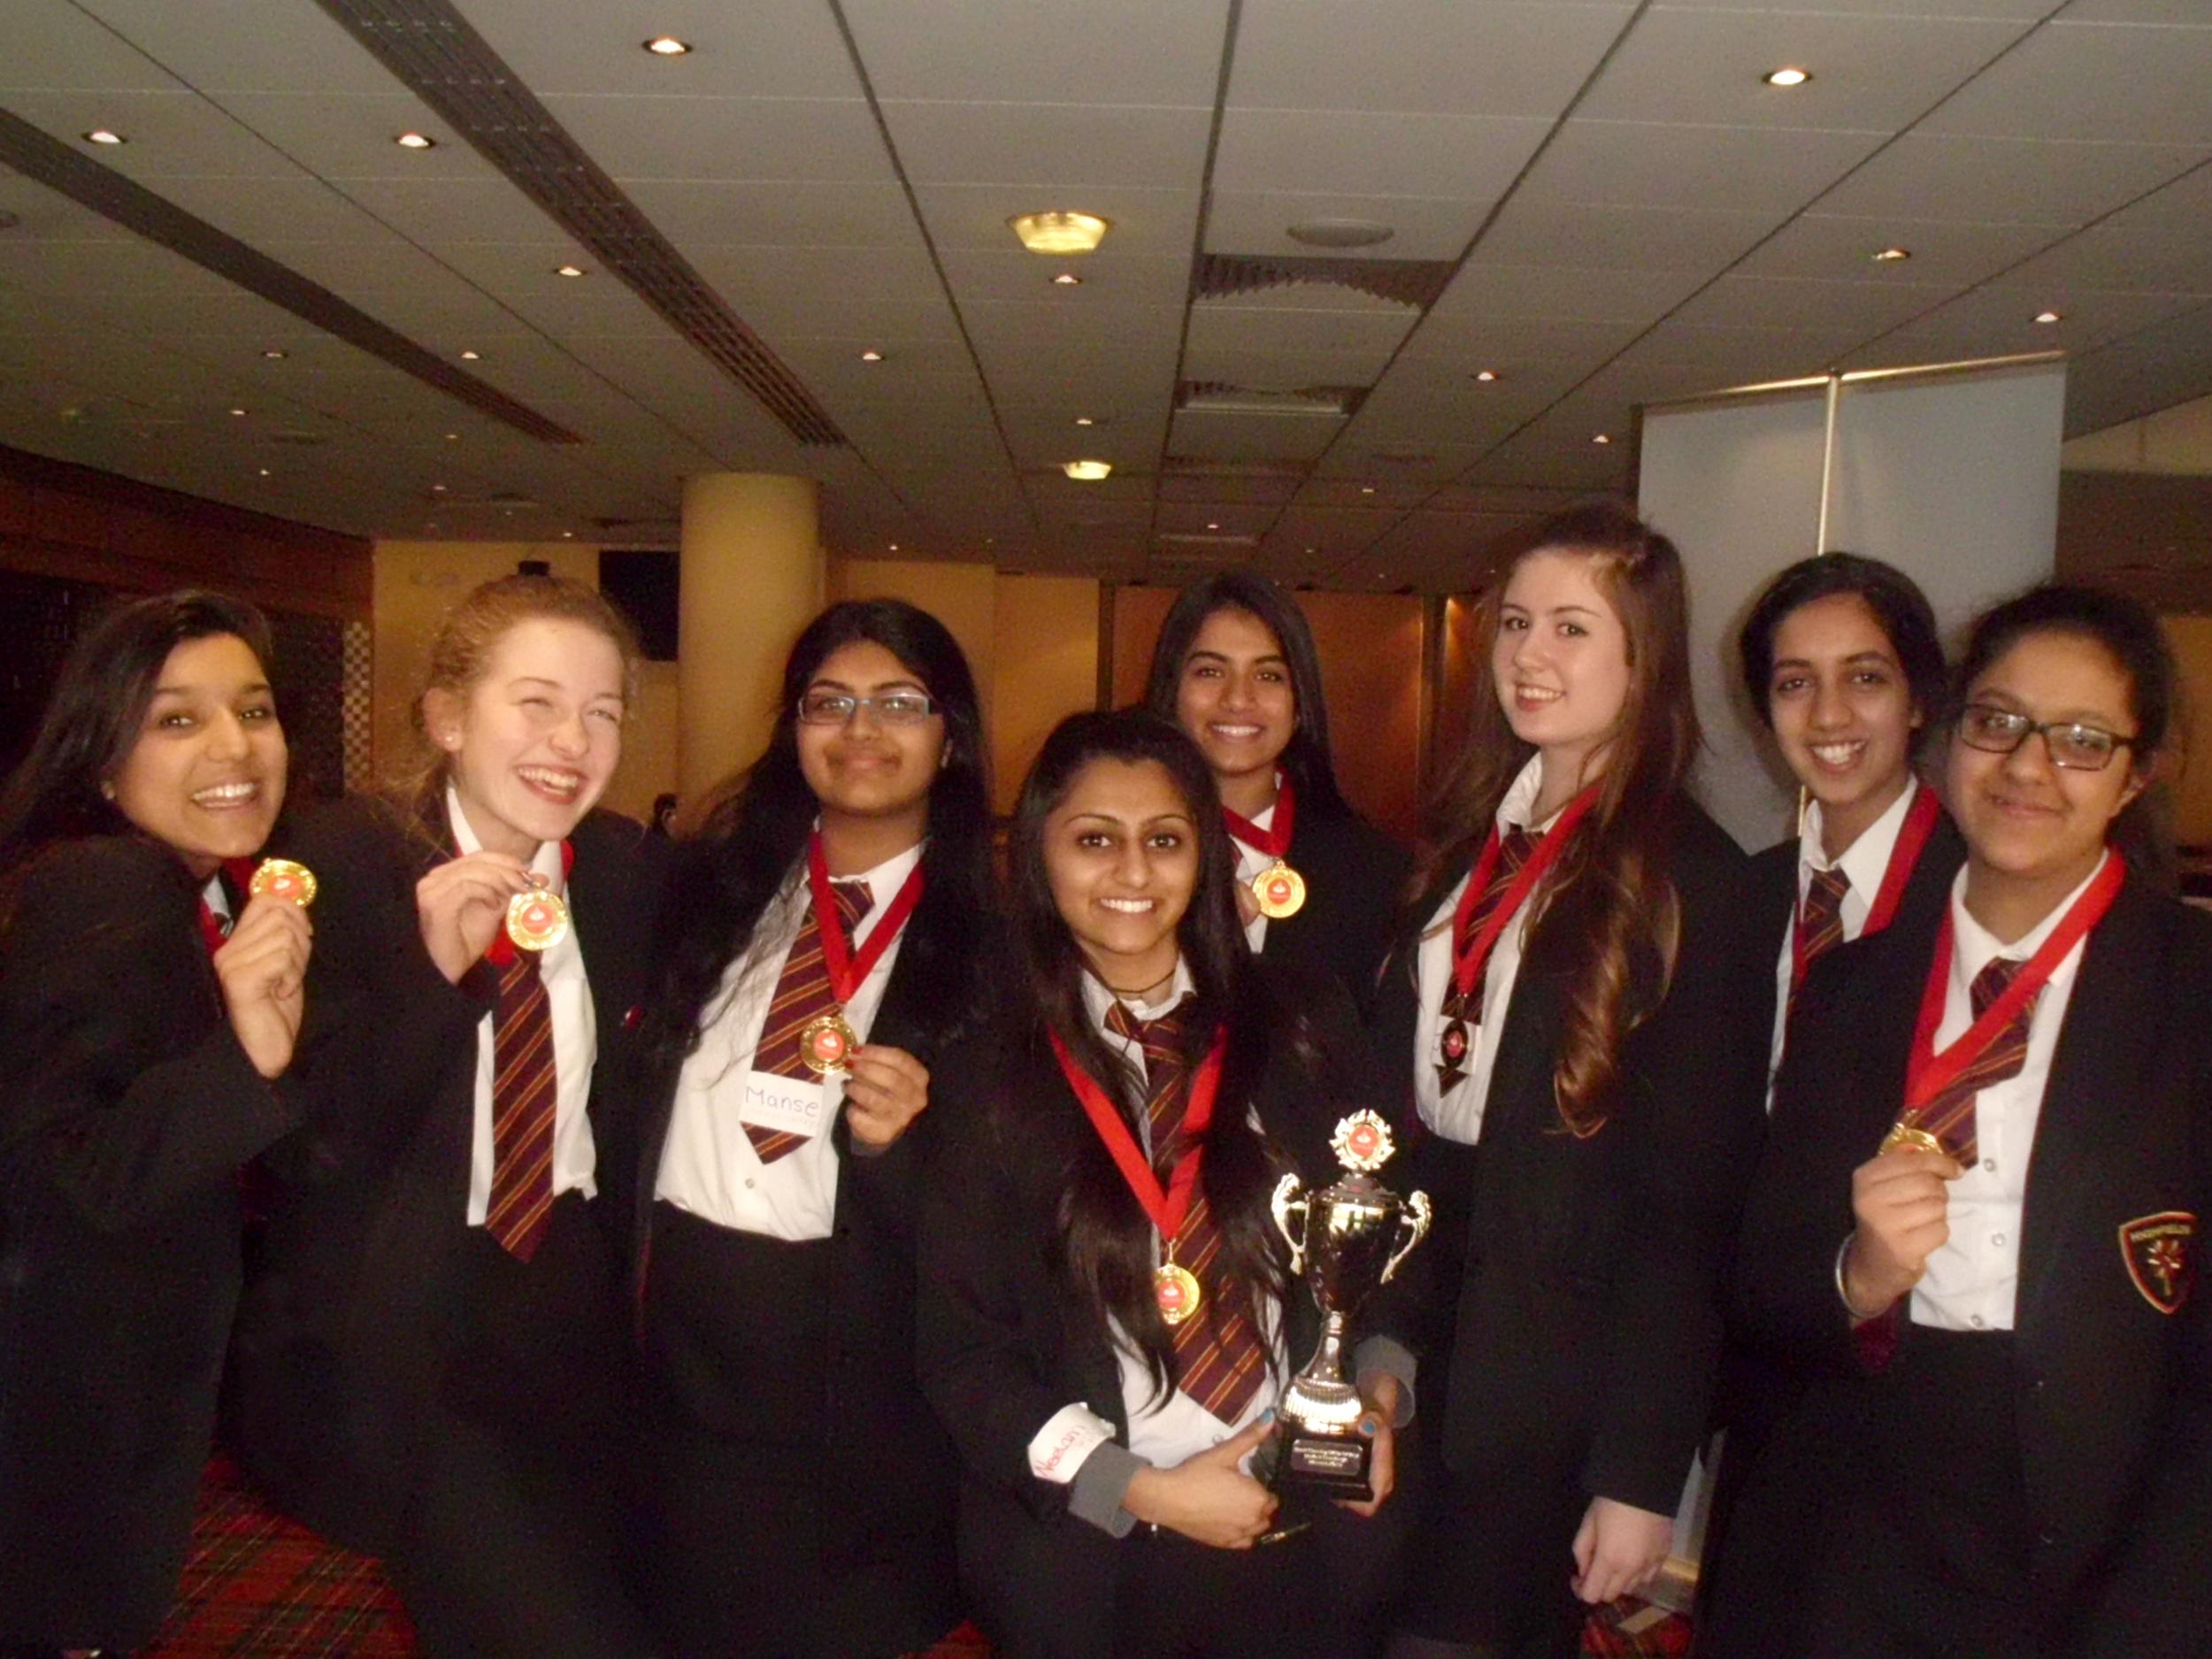 Students:Neelam Patel,Manse Jassi,Ellie White,Amnique Sidhu,Mishal Ishaq,Jordanne Farley-Moss,Jindveer Khangura,Harsimran Shuthar with their trophyand competition medals.